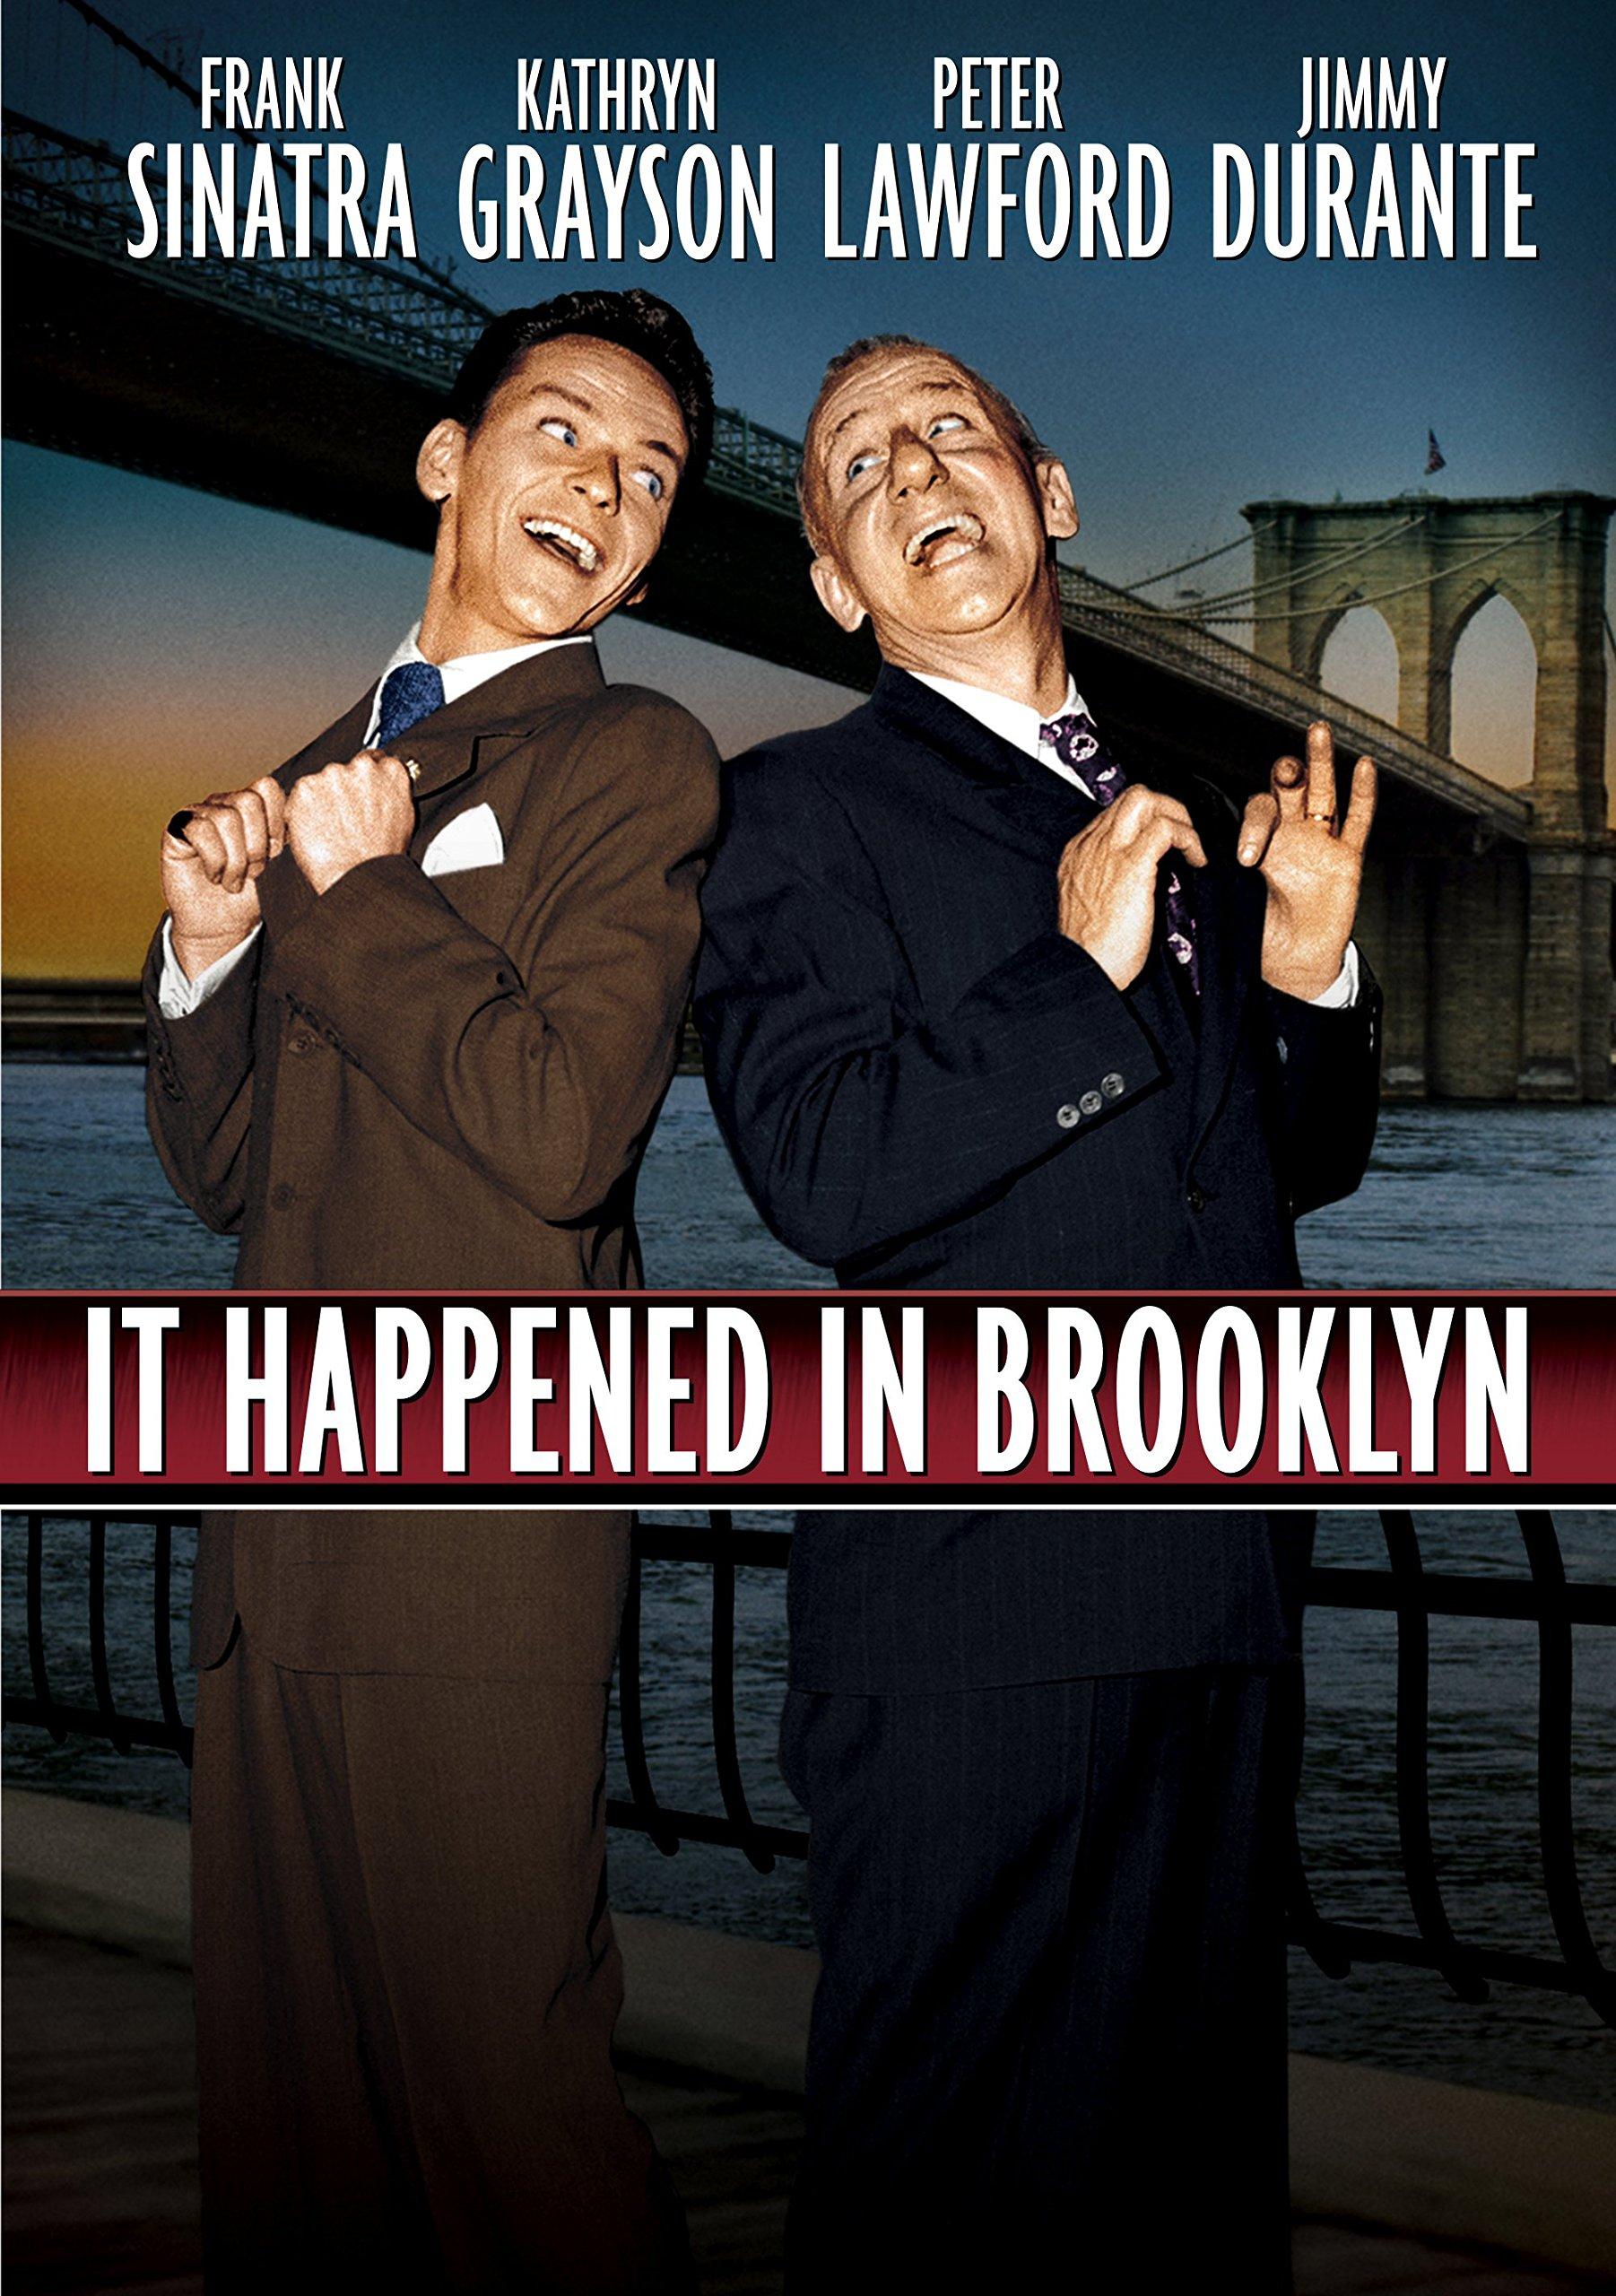 It Happened in Brooklyn (1947) starring Frank Sinatra, Kathryn Grayson, Peter Lawford, Jimmy Durante, Gloria Grahame